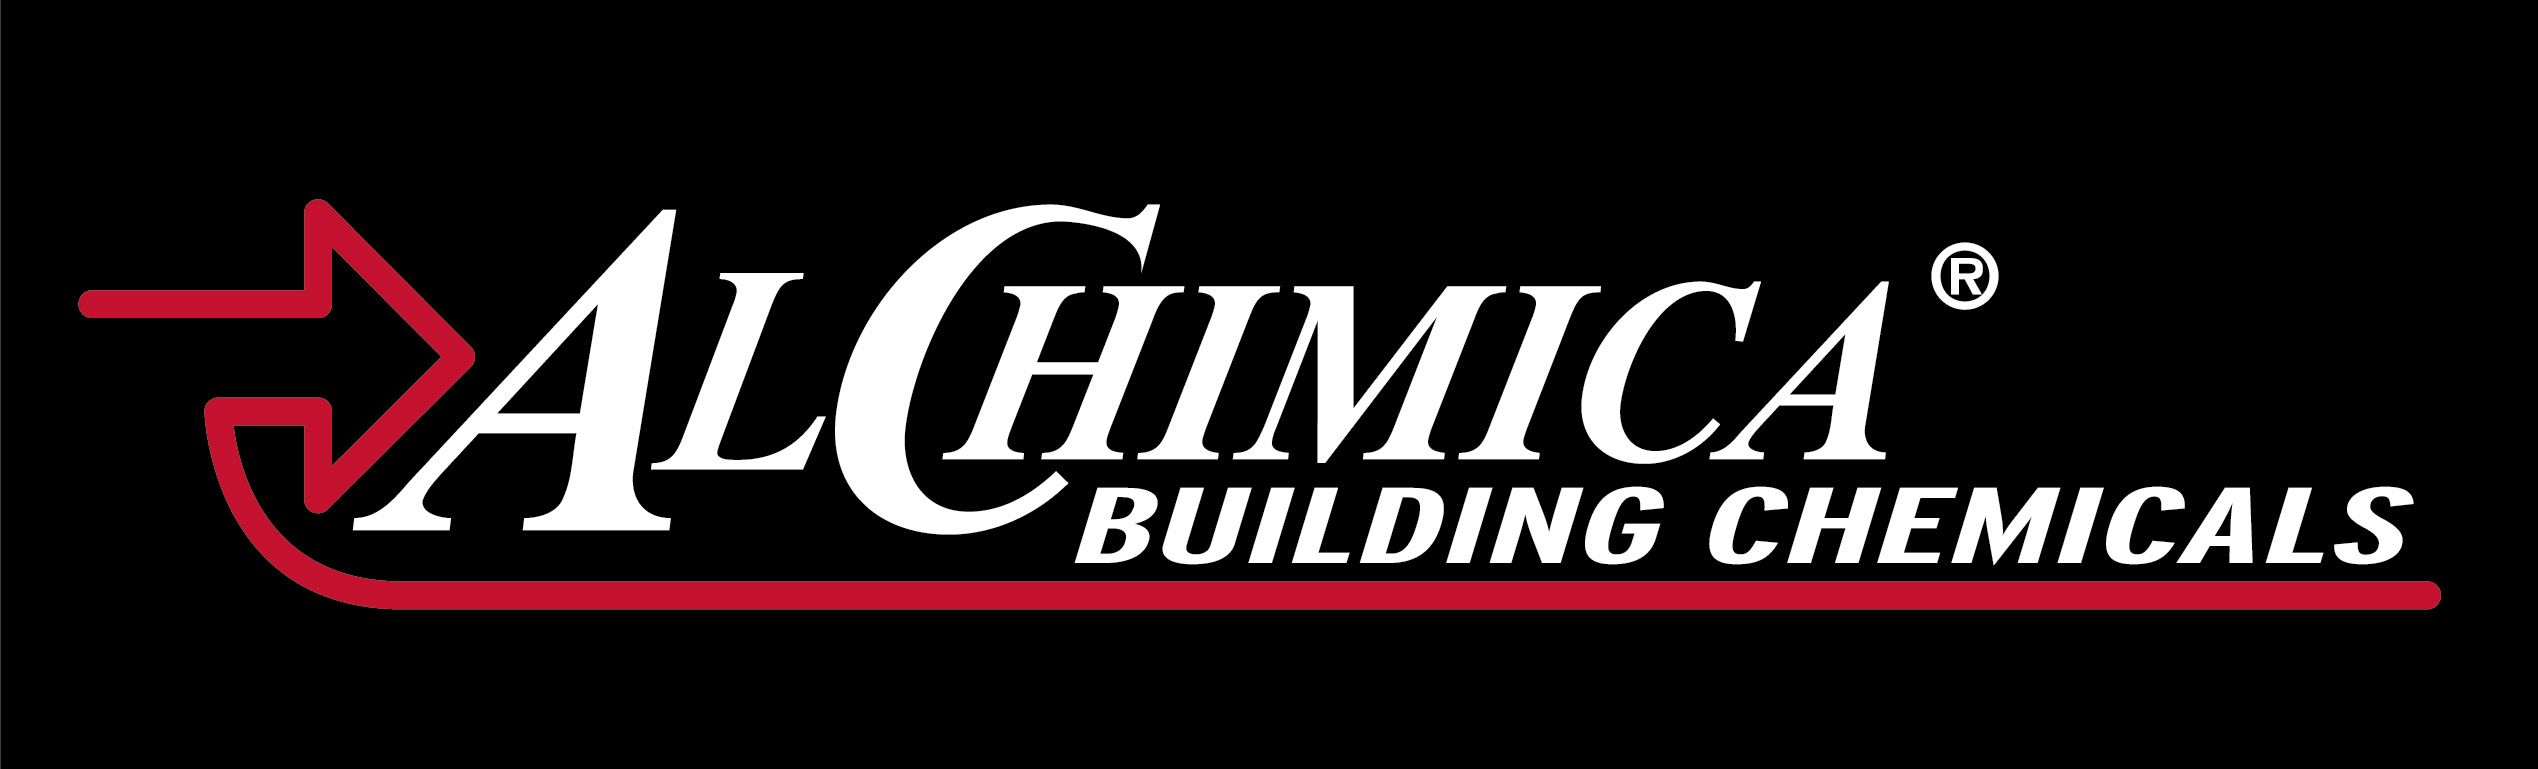 Alchimica Building Chemicals